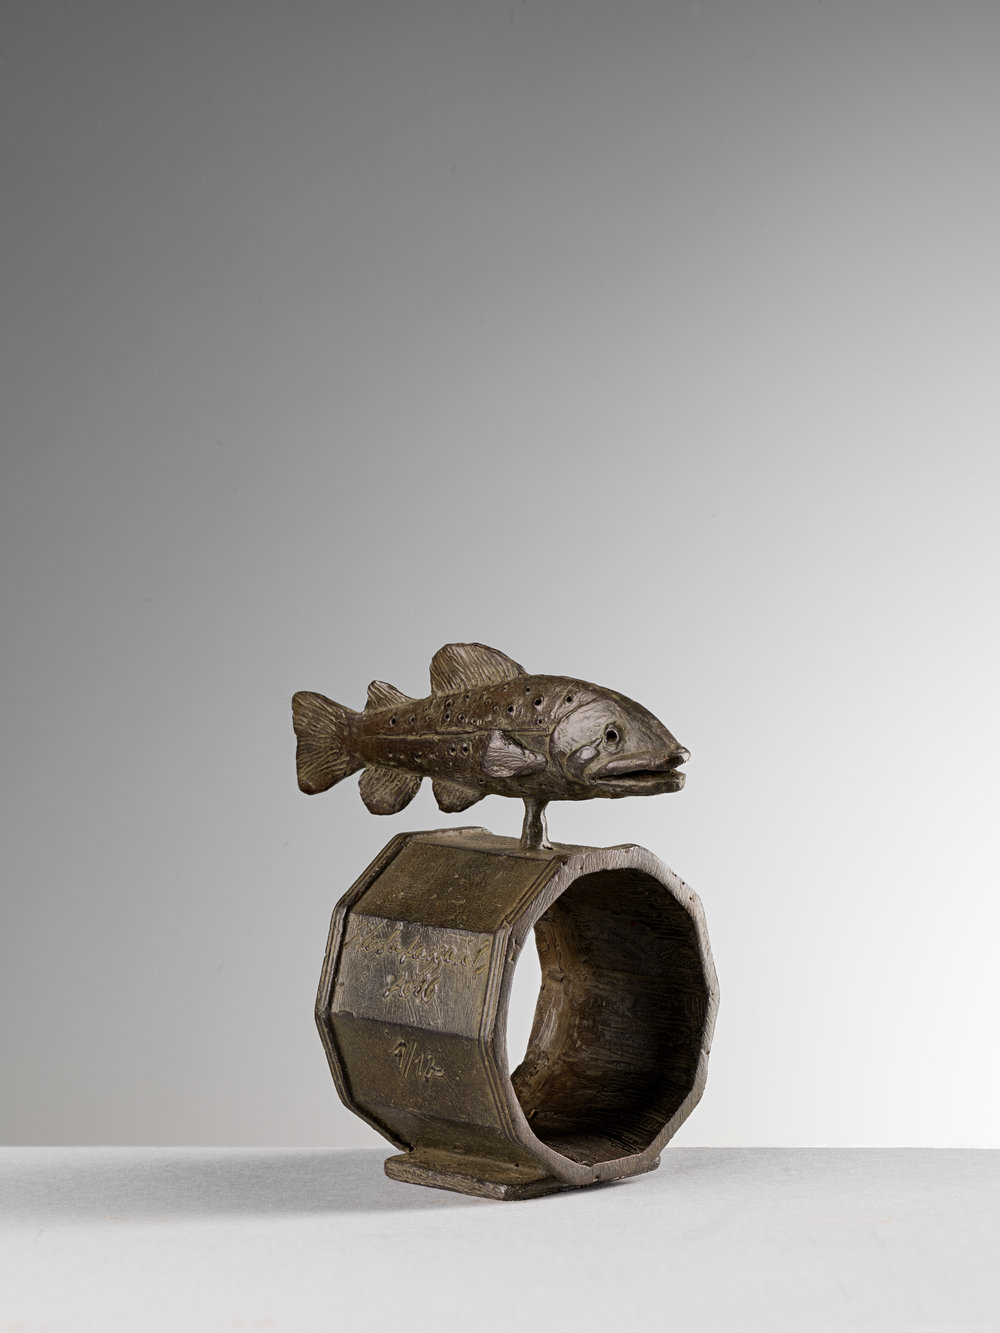 18. Fish Napkin Ring, ' Pesce' by Nicola Lazzari 8cm H x 5cm W x 4cm D .jpg